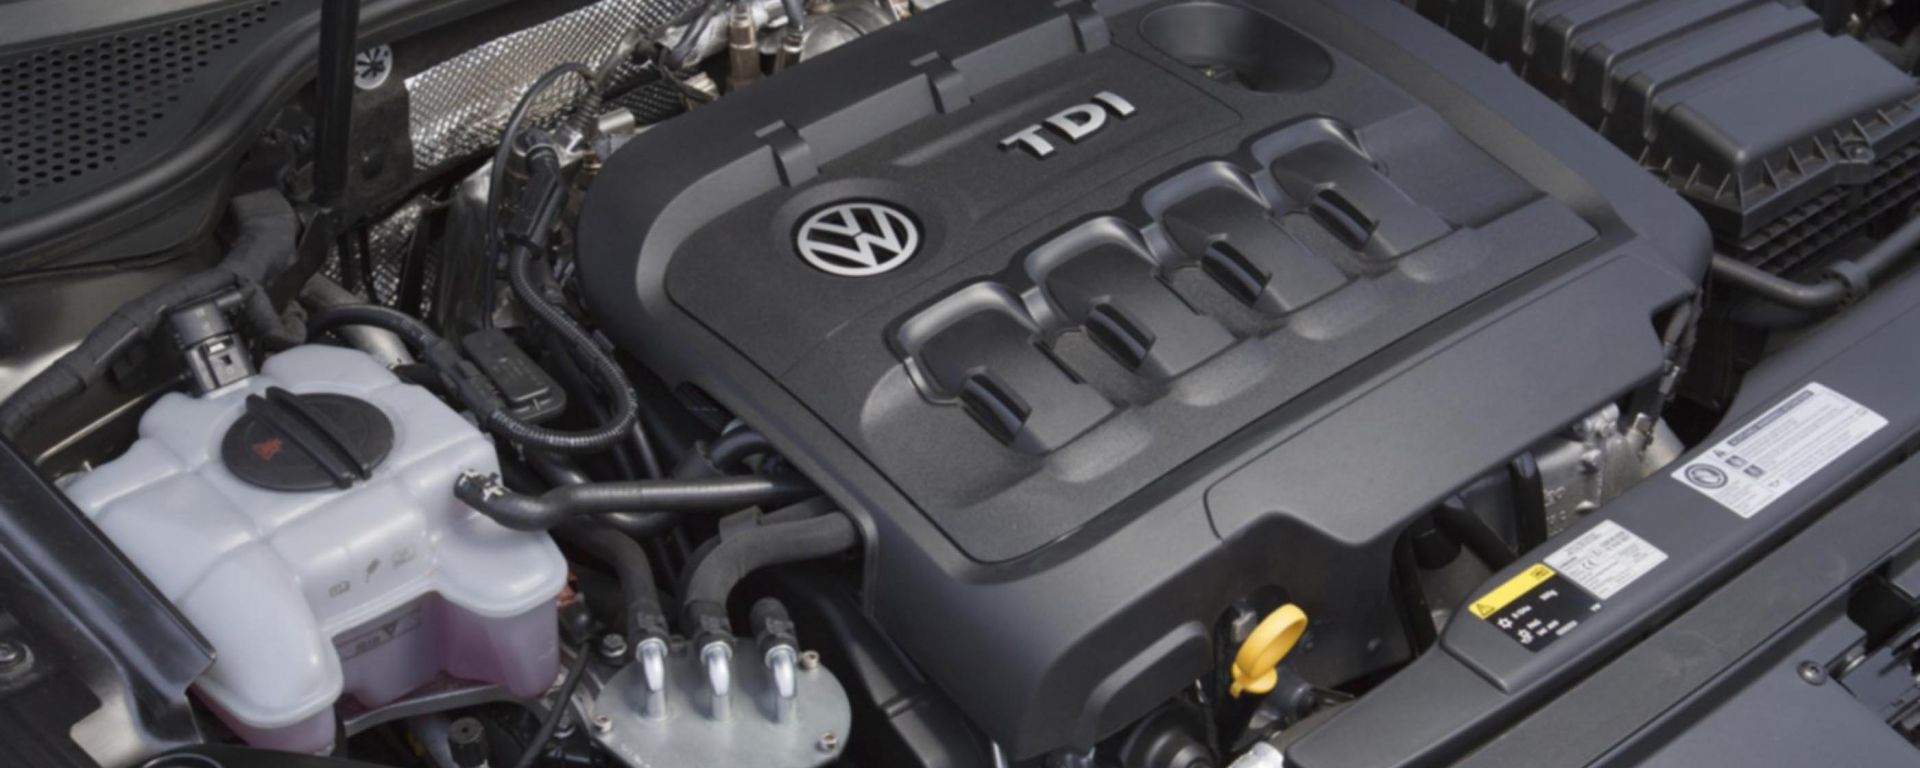 Dieselgate: Volkswagen inizia i richiami del 1.2 TDI